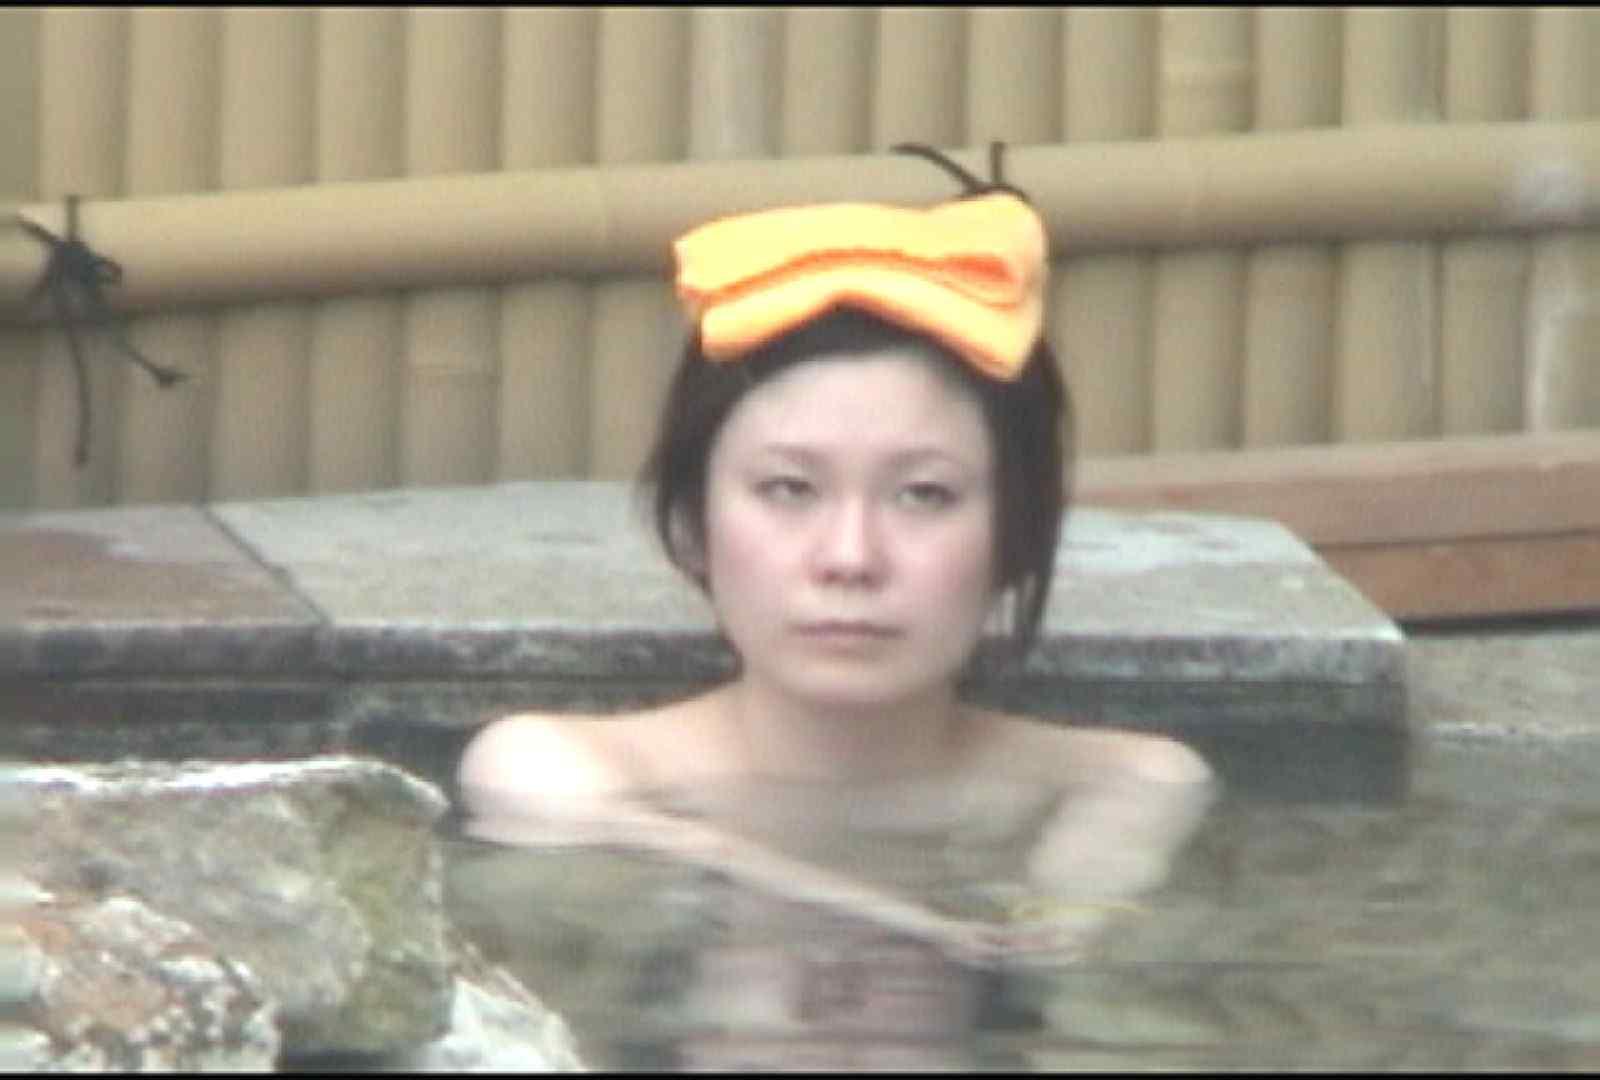 Aquaな露天風呂Vol.177 綺麗なOLたち アダルト動画キャプチャ 112枚 44